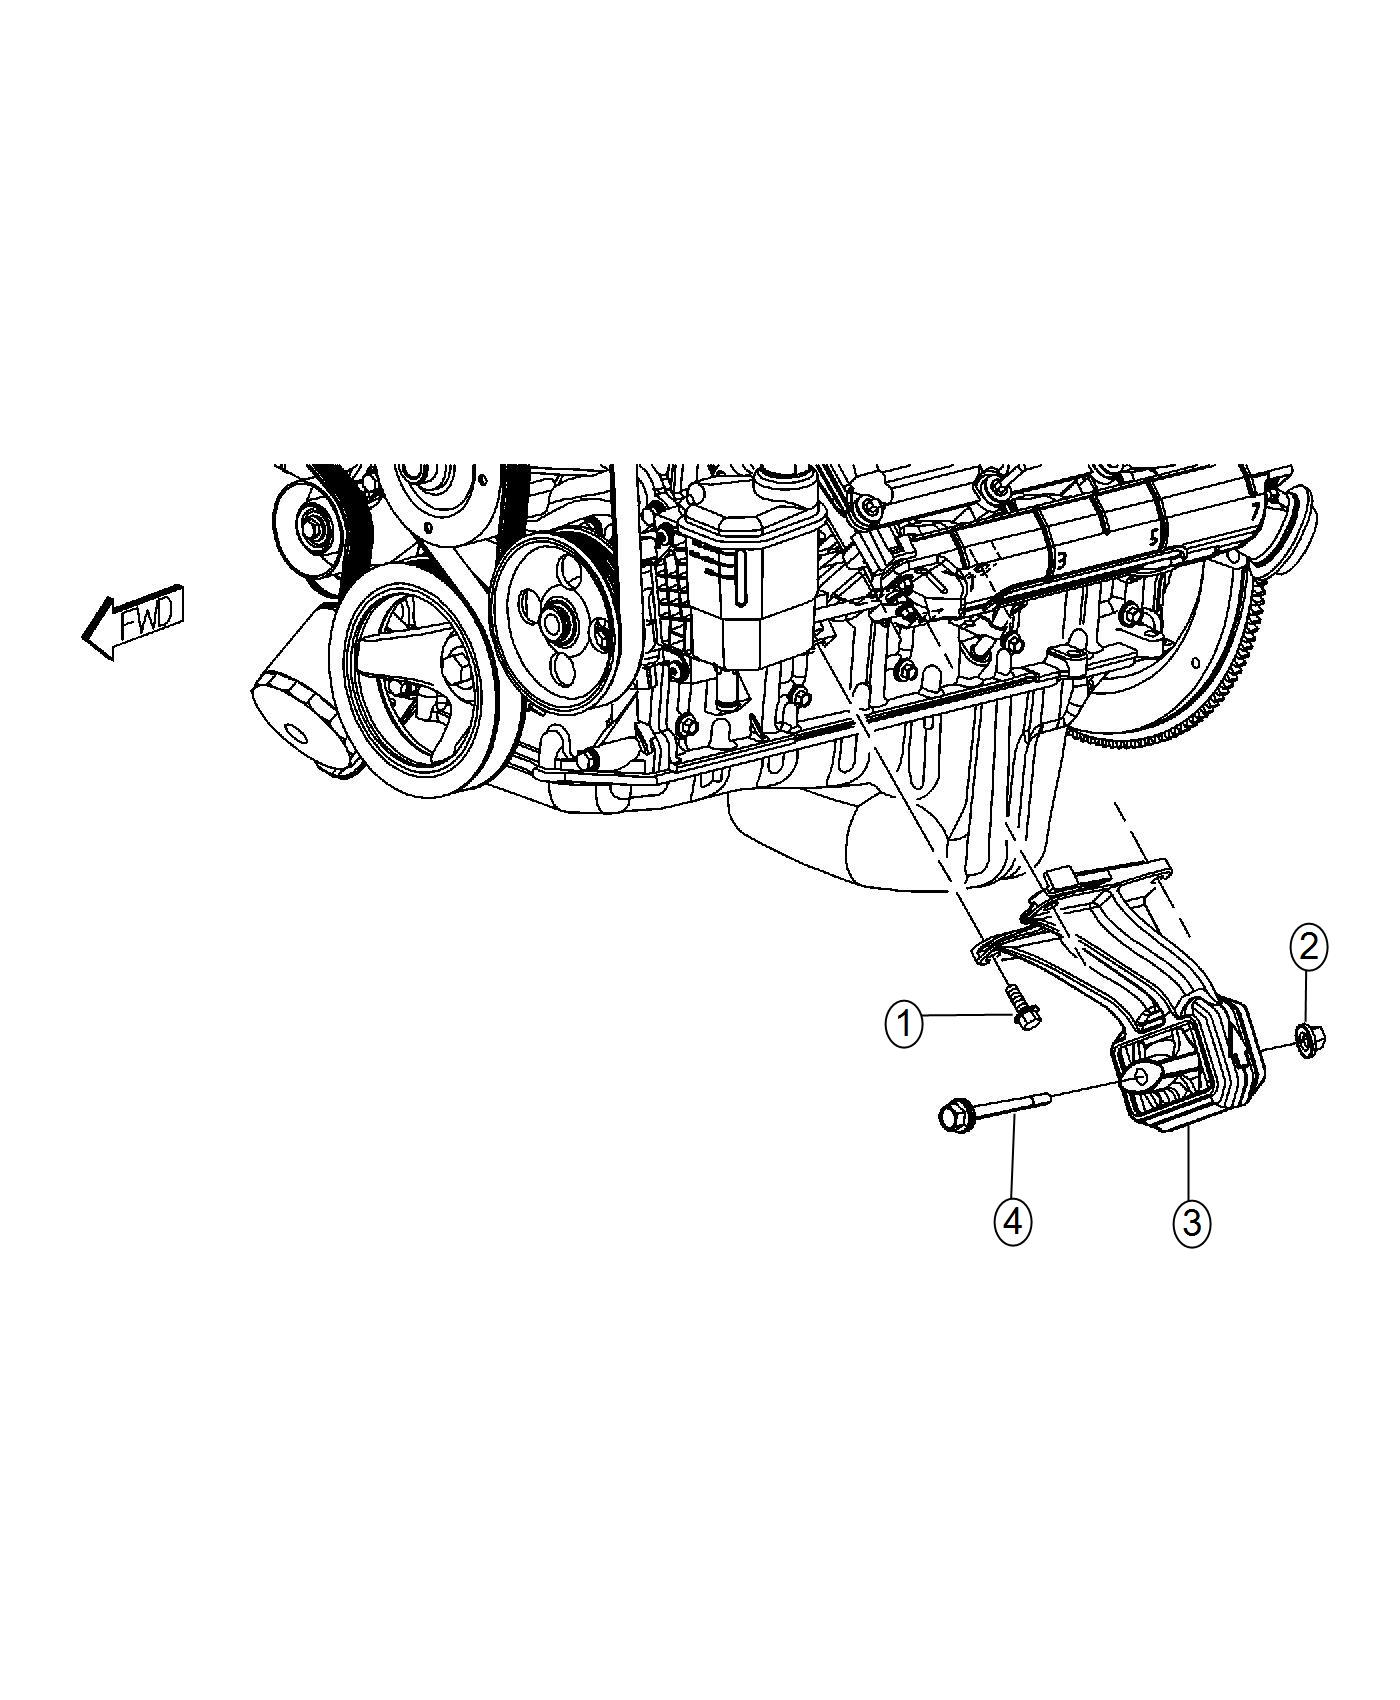 Ram Insulator Engine Mount Left Side Mounting Rwd Cng